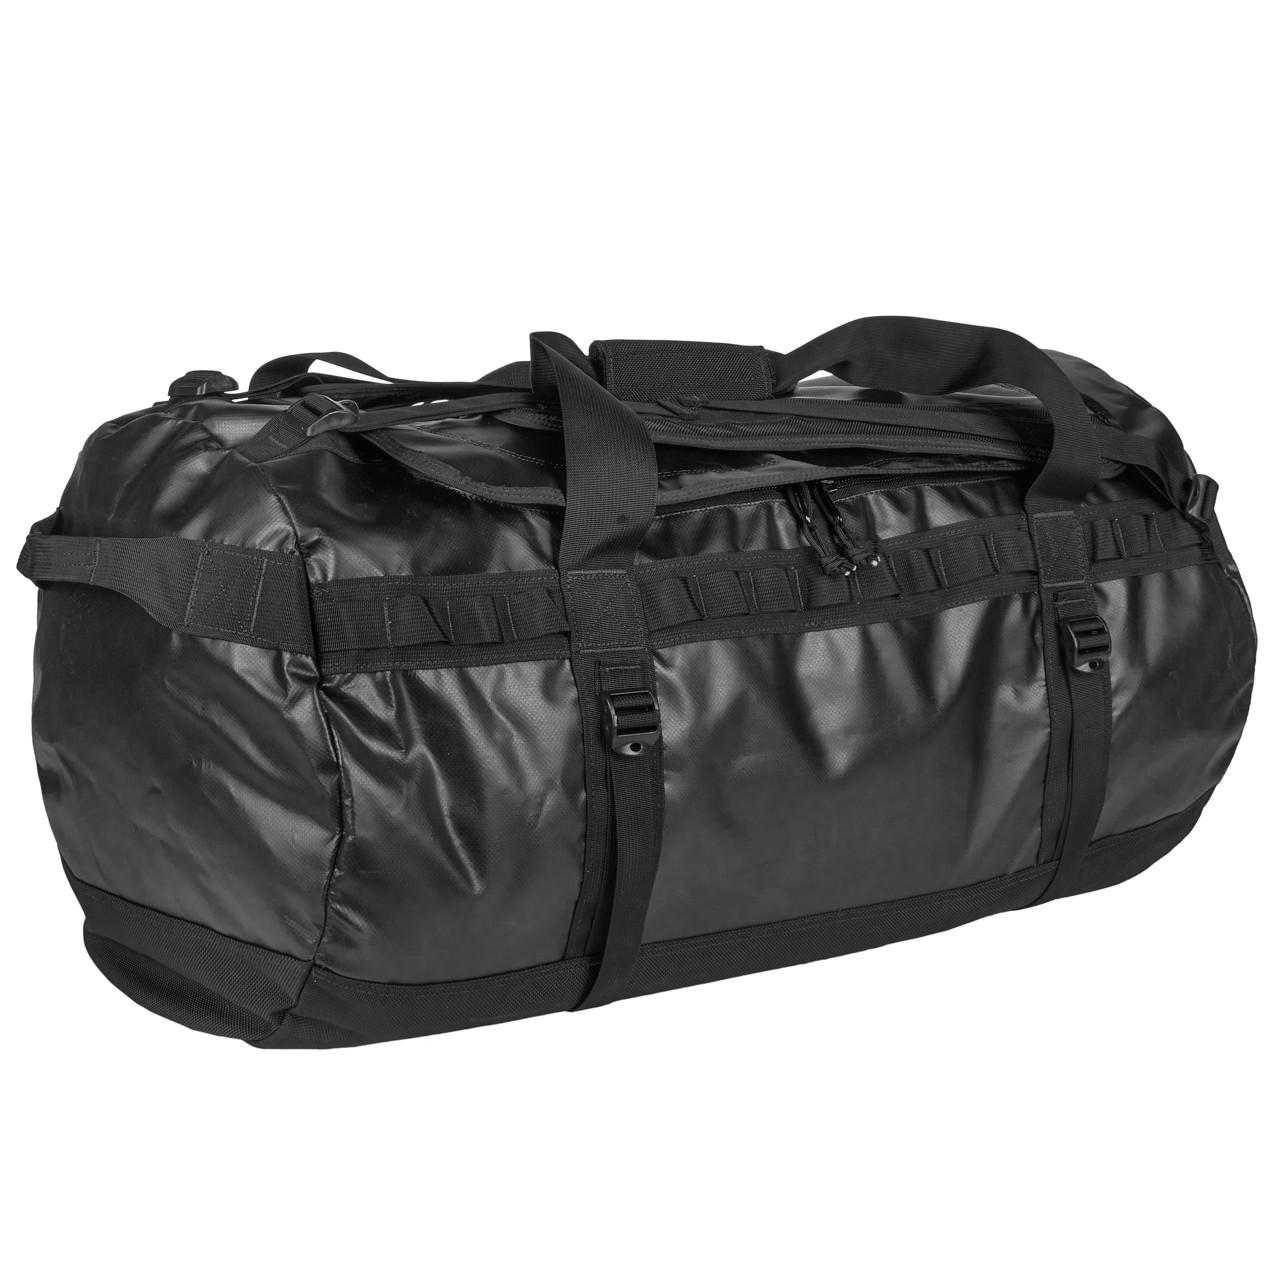 51074 TACMASTER MILITARY DUFFLE BAG, X-LARGE